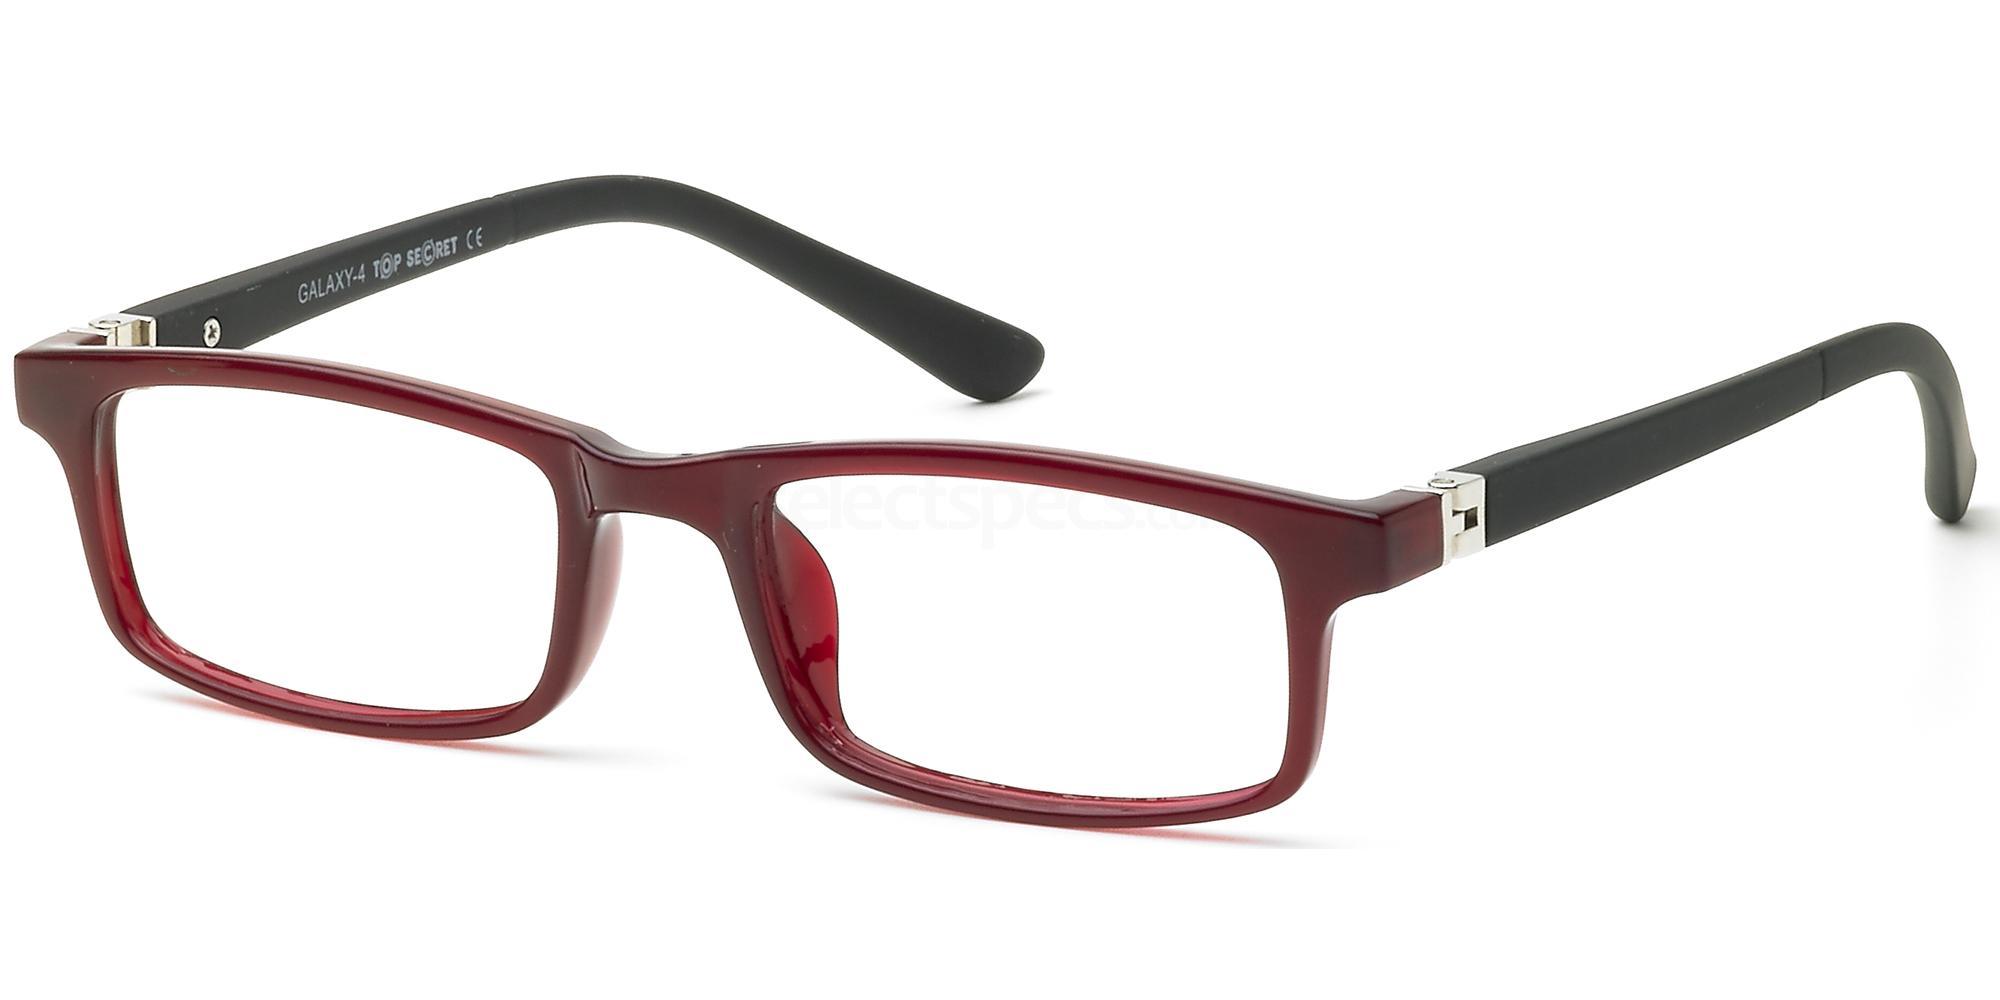 C1 GALAXY4 Glasses, Top Secret KIDS